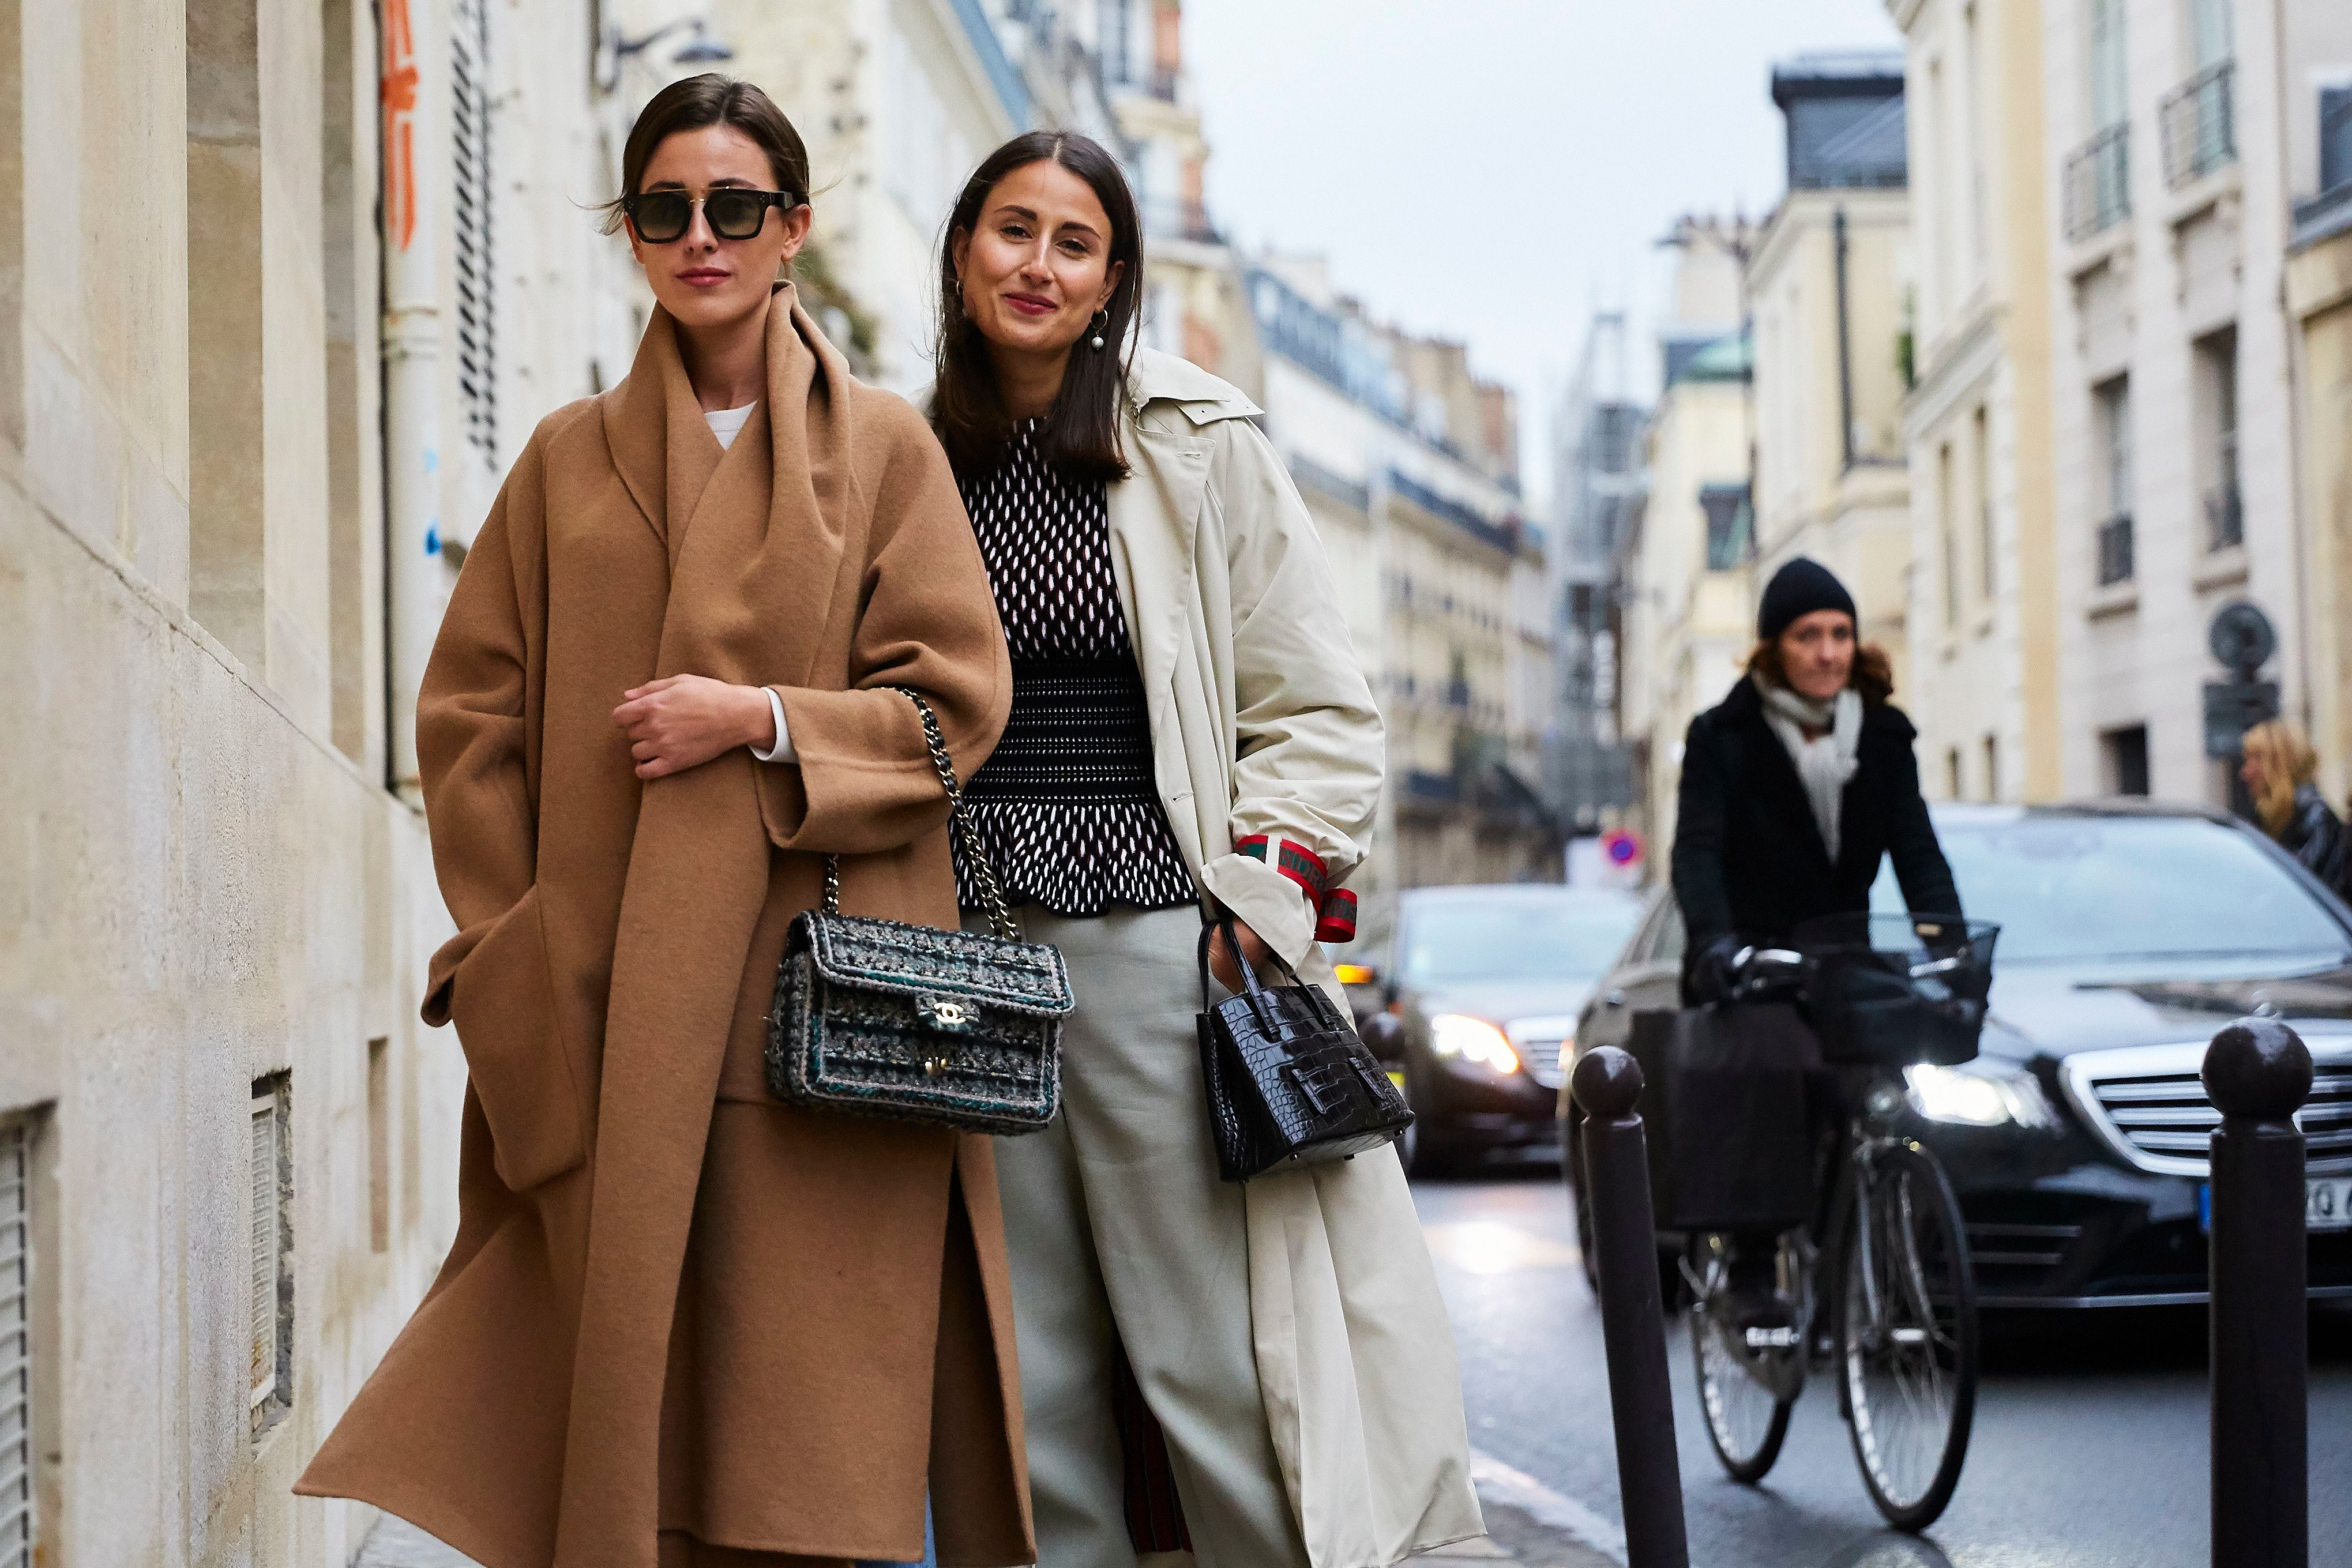 Sylvia Haghjoo, Julia HaghjooStreet Style, Spring Summer 2019, Haute Couture Fashion Week, Paris, France - 23 Jan 2019